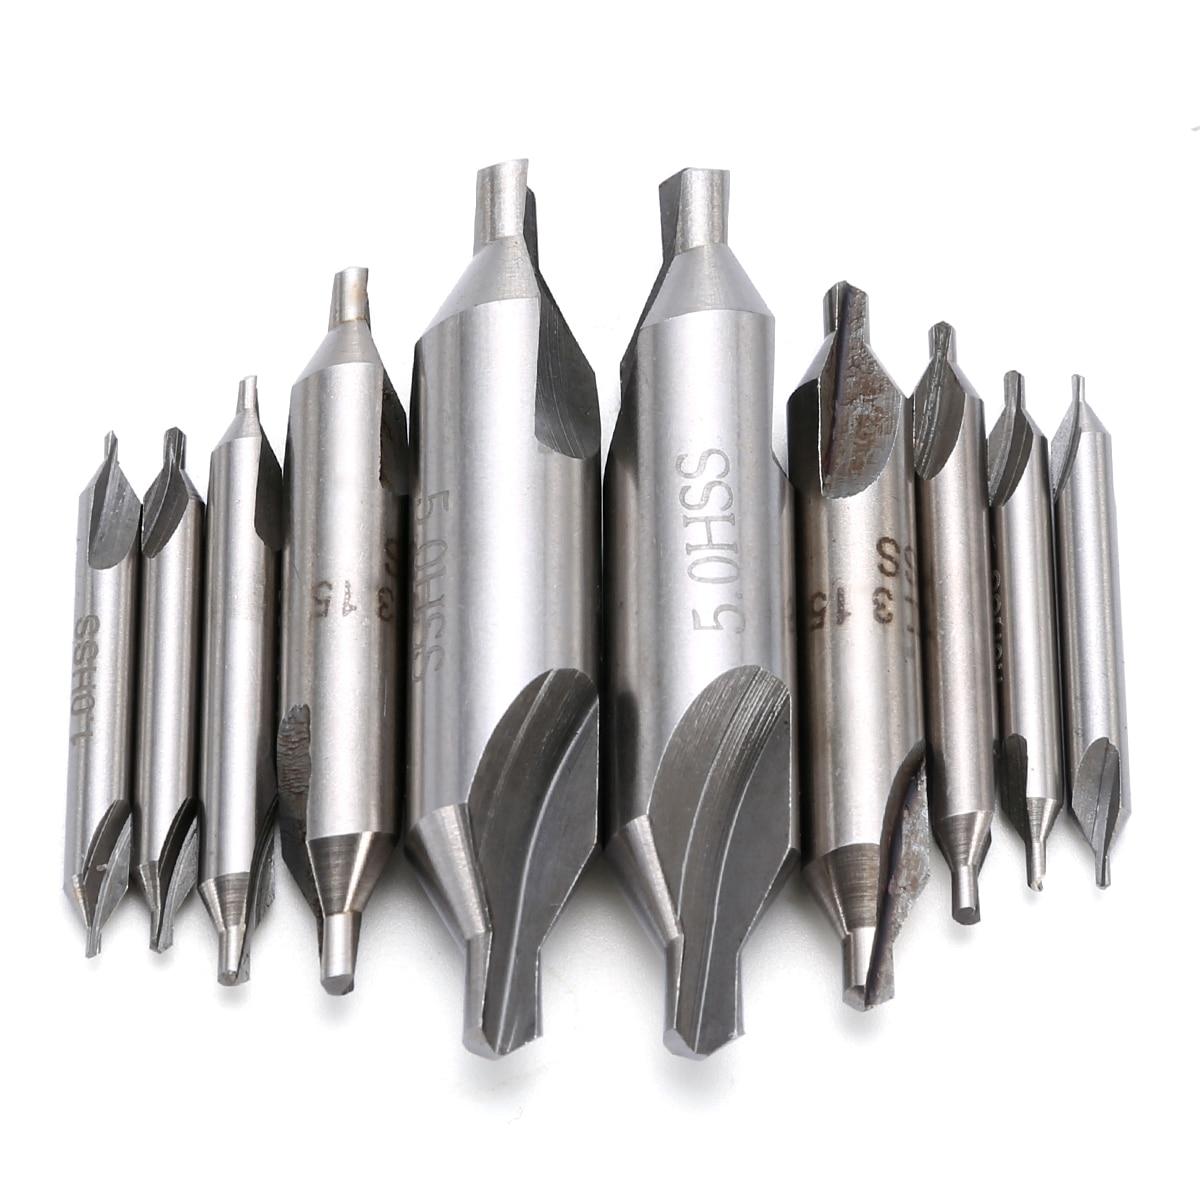 10 stücke 60 Grad Kombiniert Senker-Center Bohrer Bits 1/1.5/2/3.15/5mm High Speed Stahl Für Power Tools